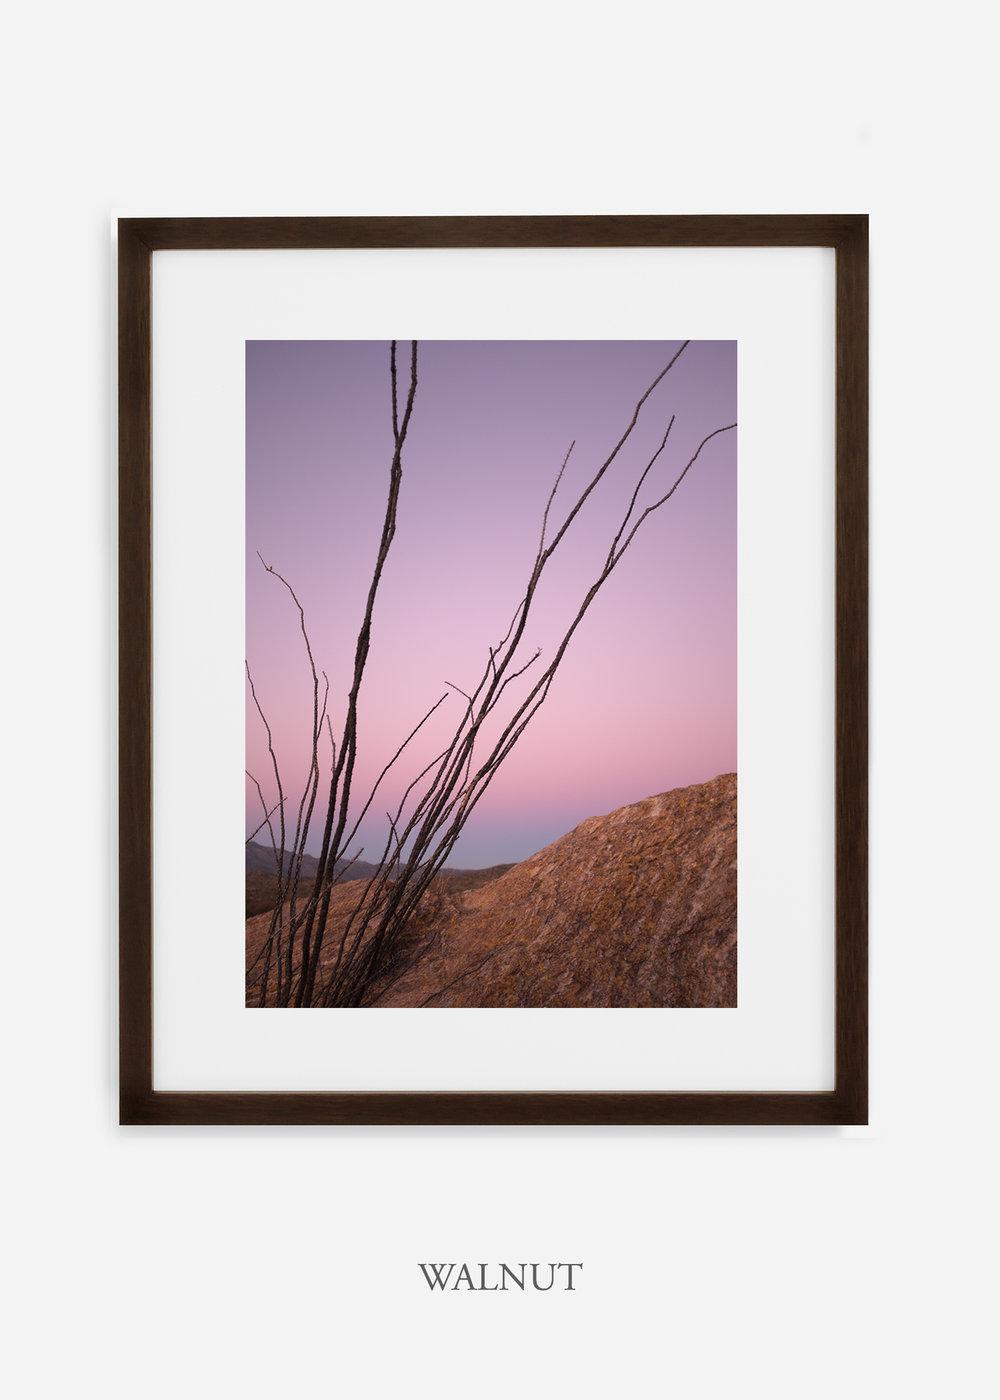 walnutframe-saguaroNo.12-wildercalifornia-art-wallart-cactusprint-homedecor-prints-arizona-botanical-artwork-interiordesign.jpg